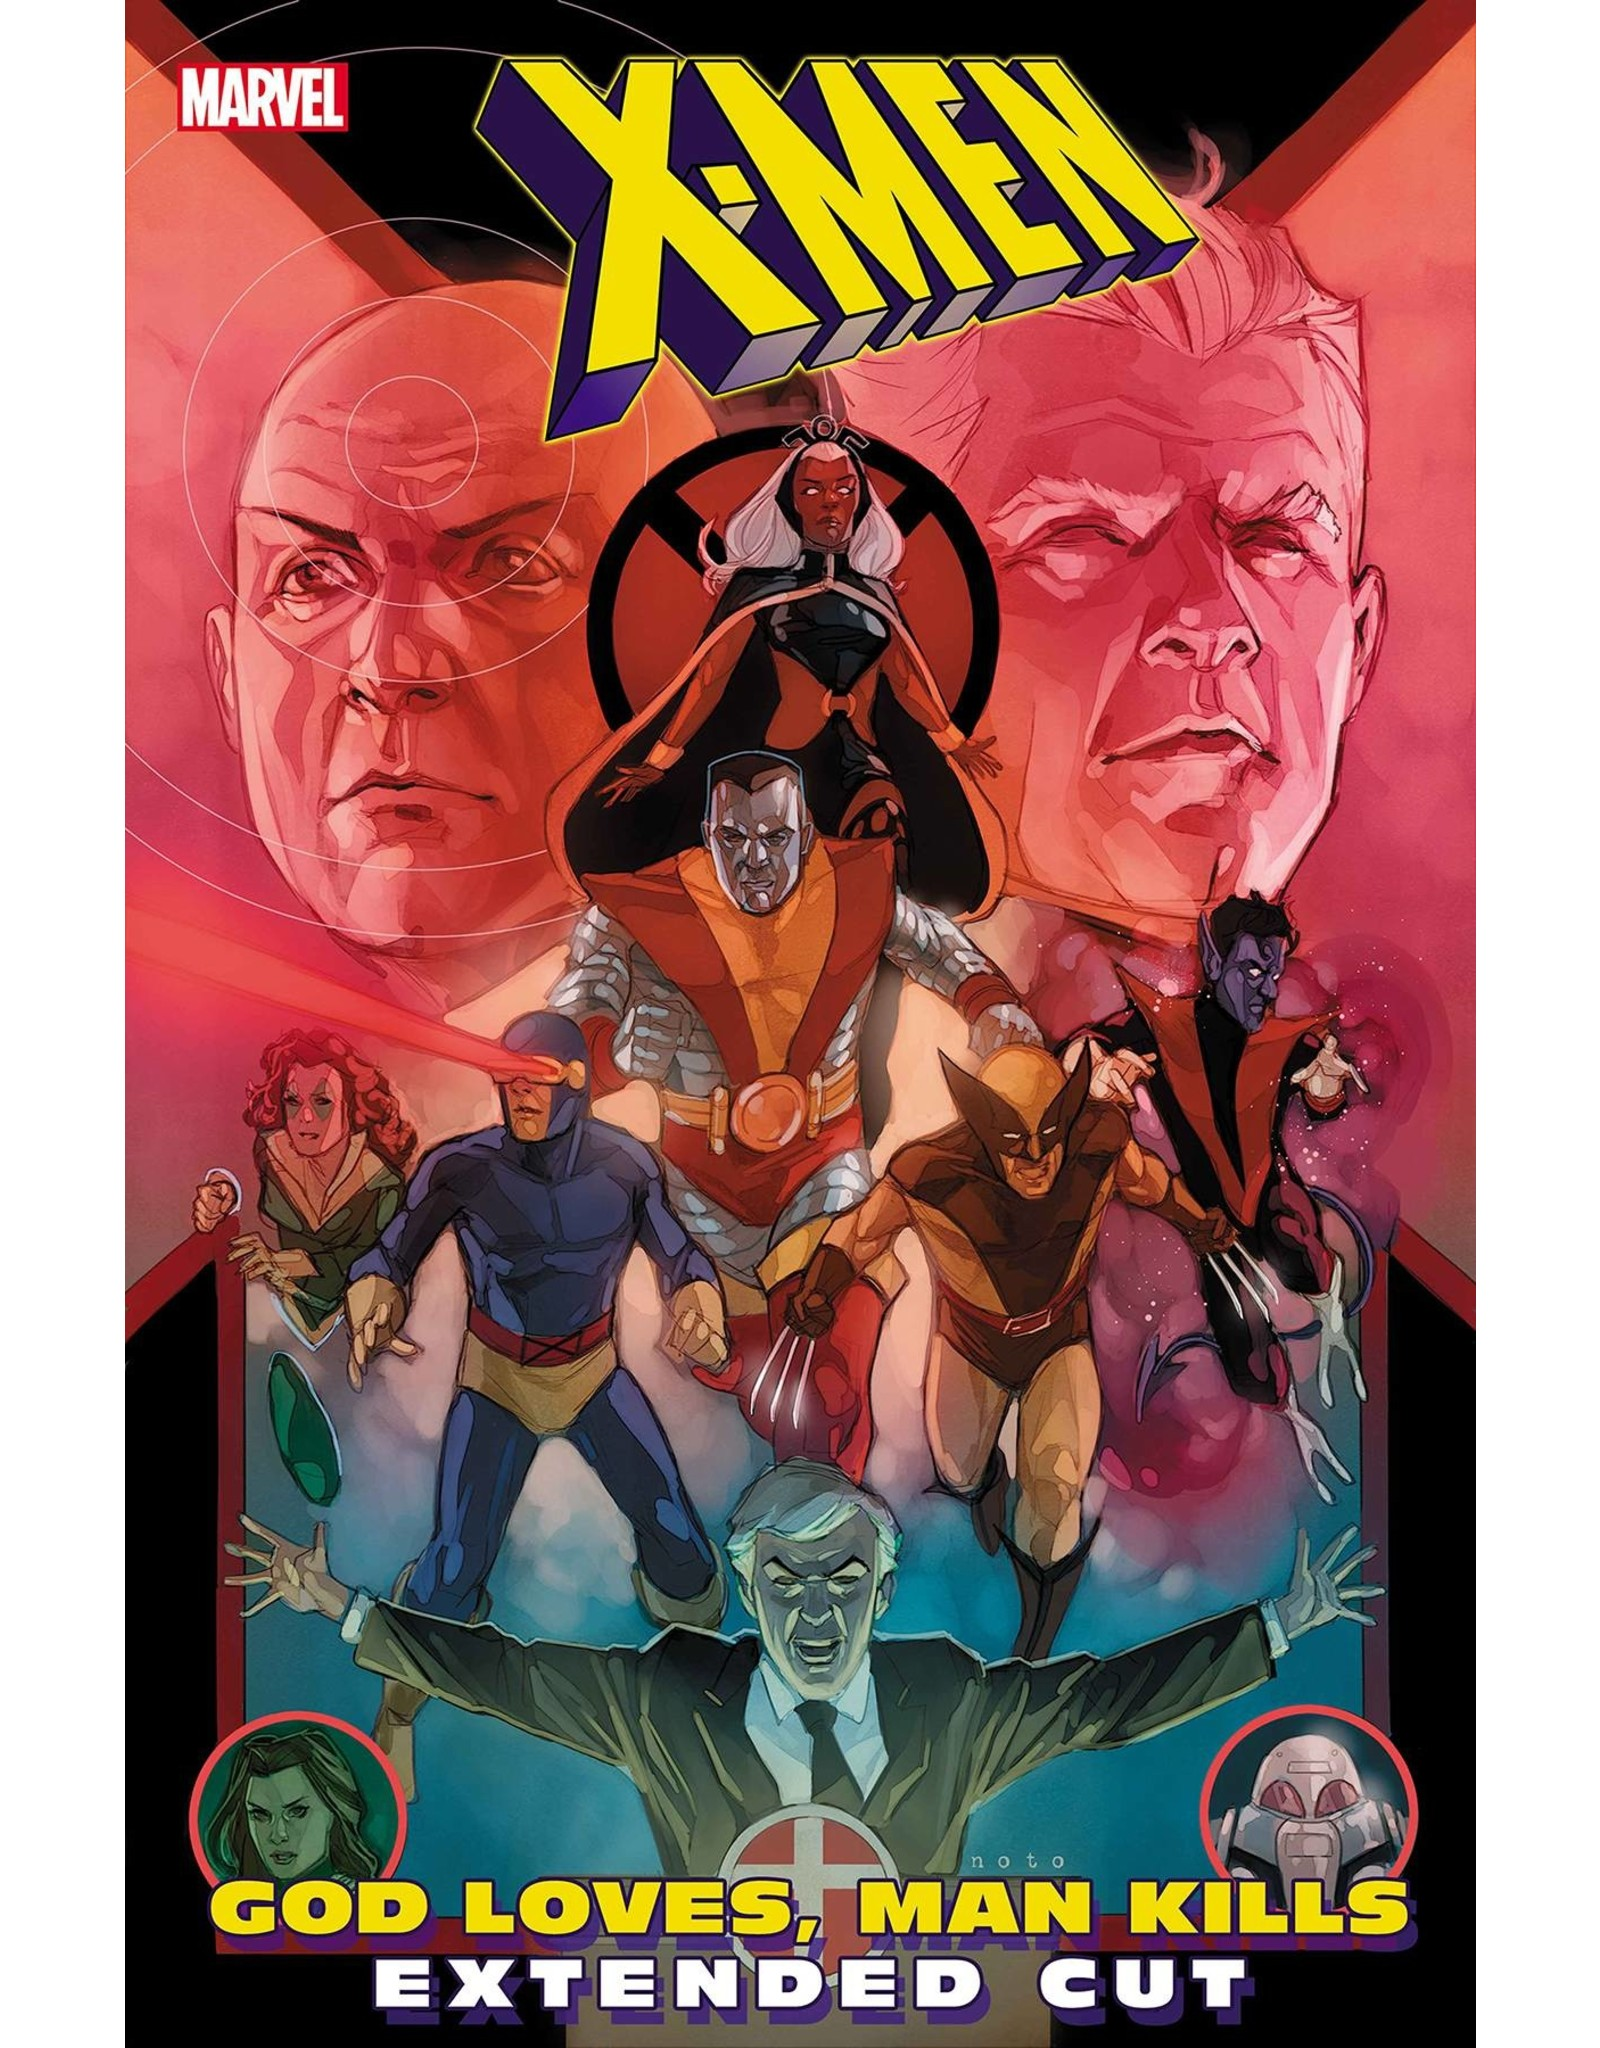 MARVEL COMICS X-MEN GOD LOVES MAN KILLS EXTENDED CUT #2 (OF 2)